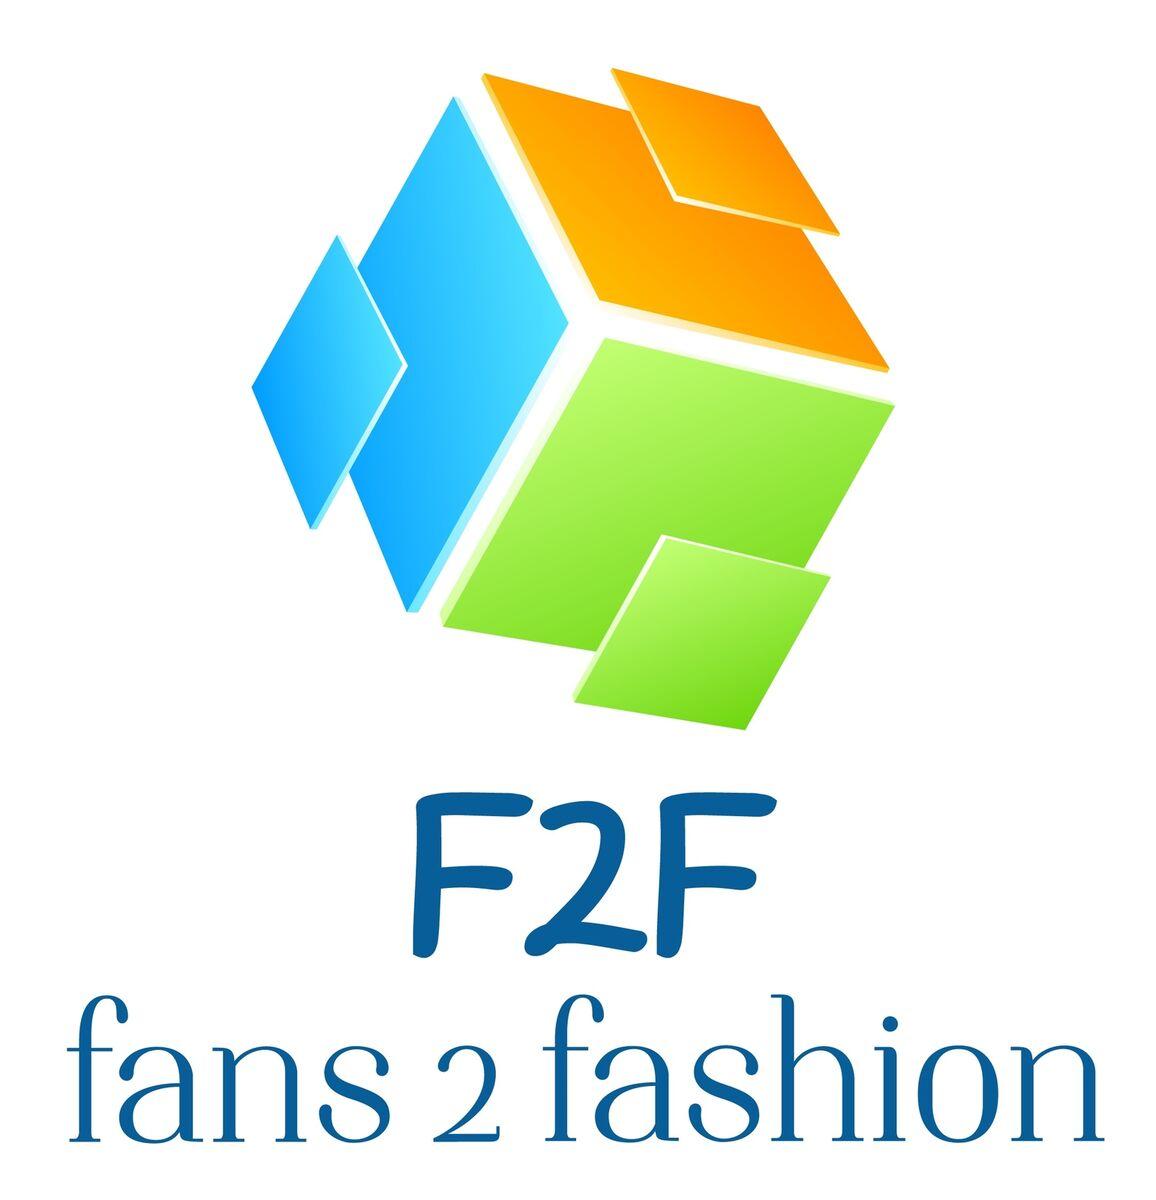 fans2fashion